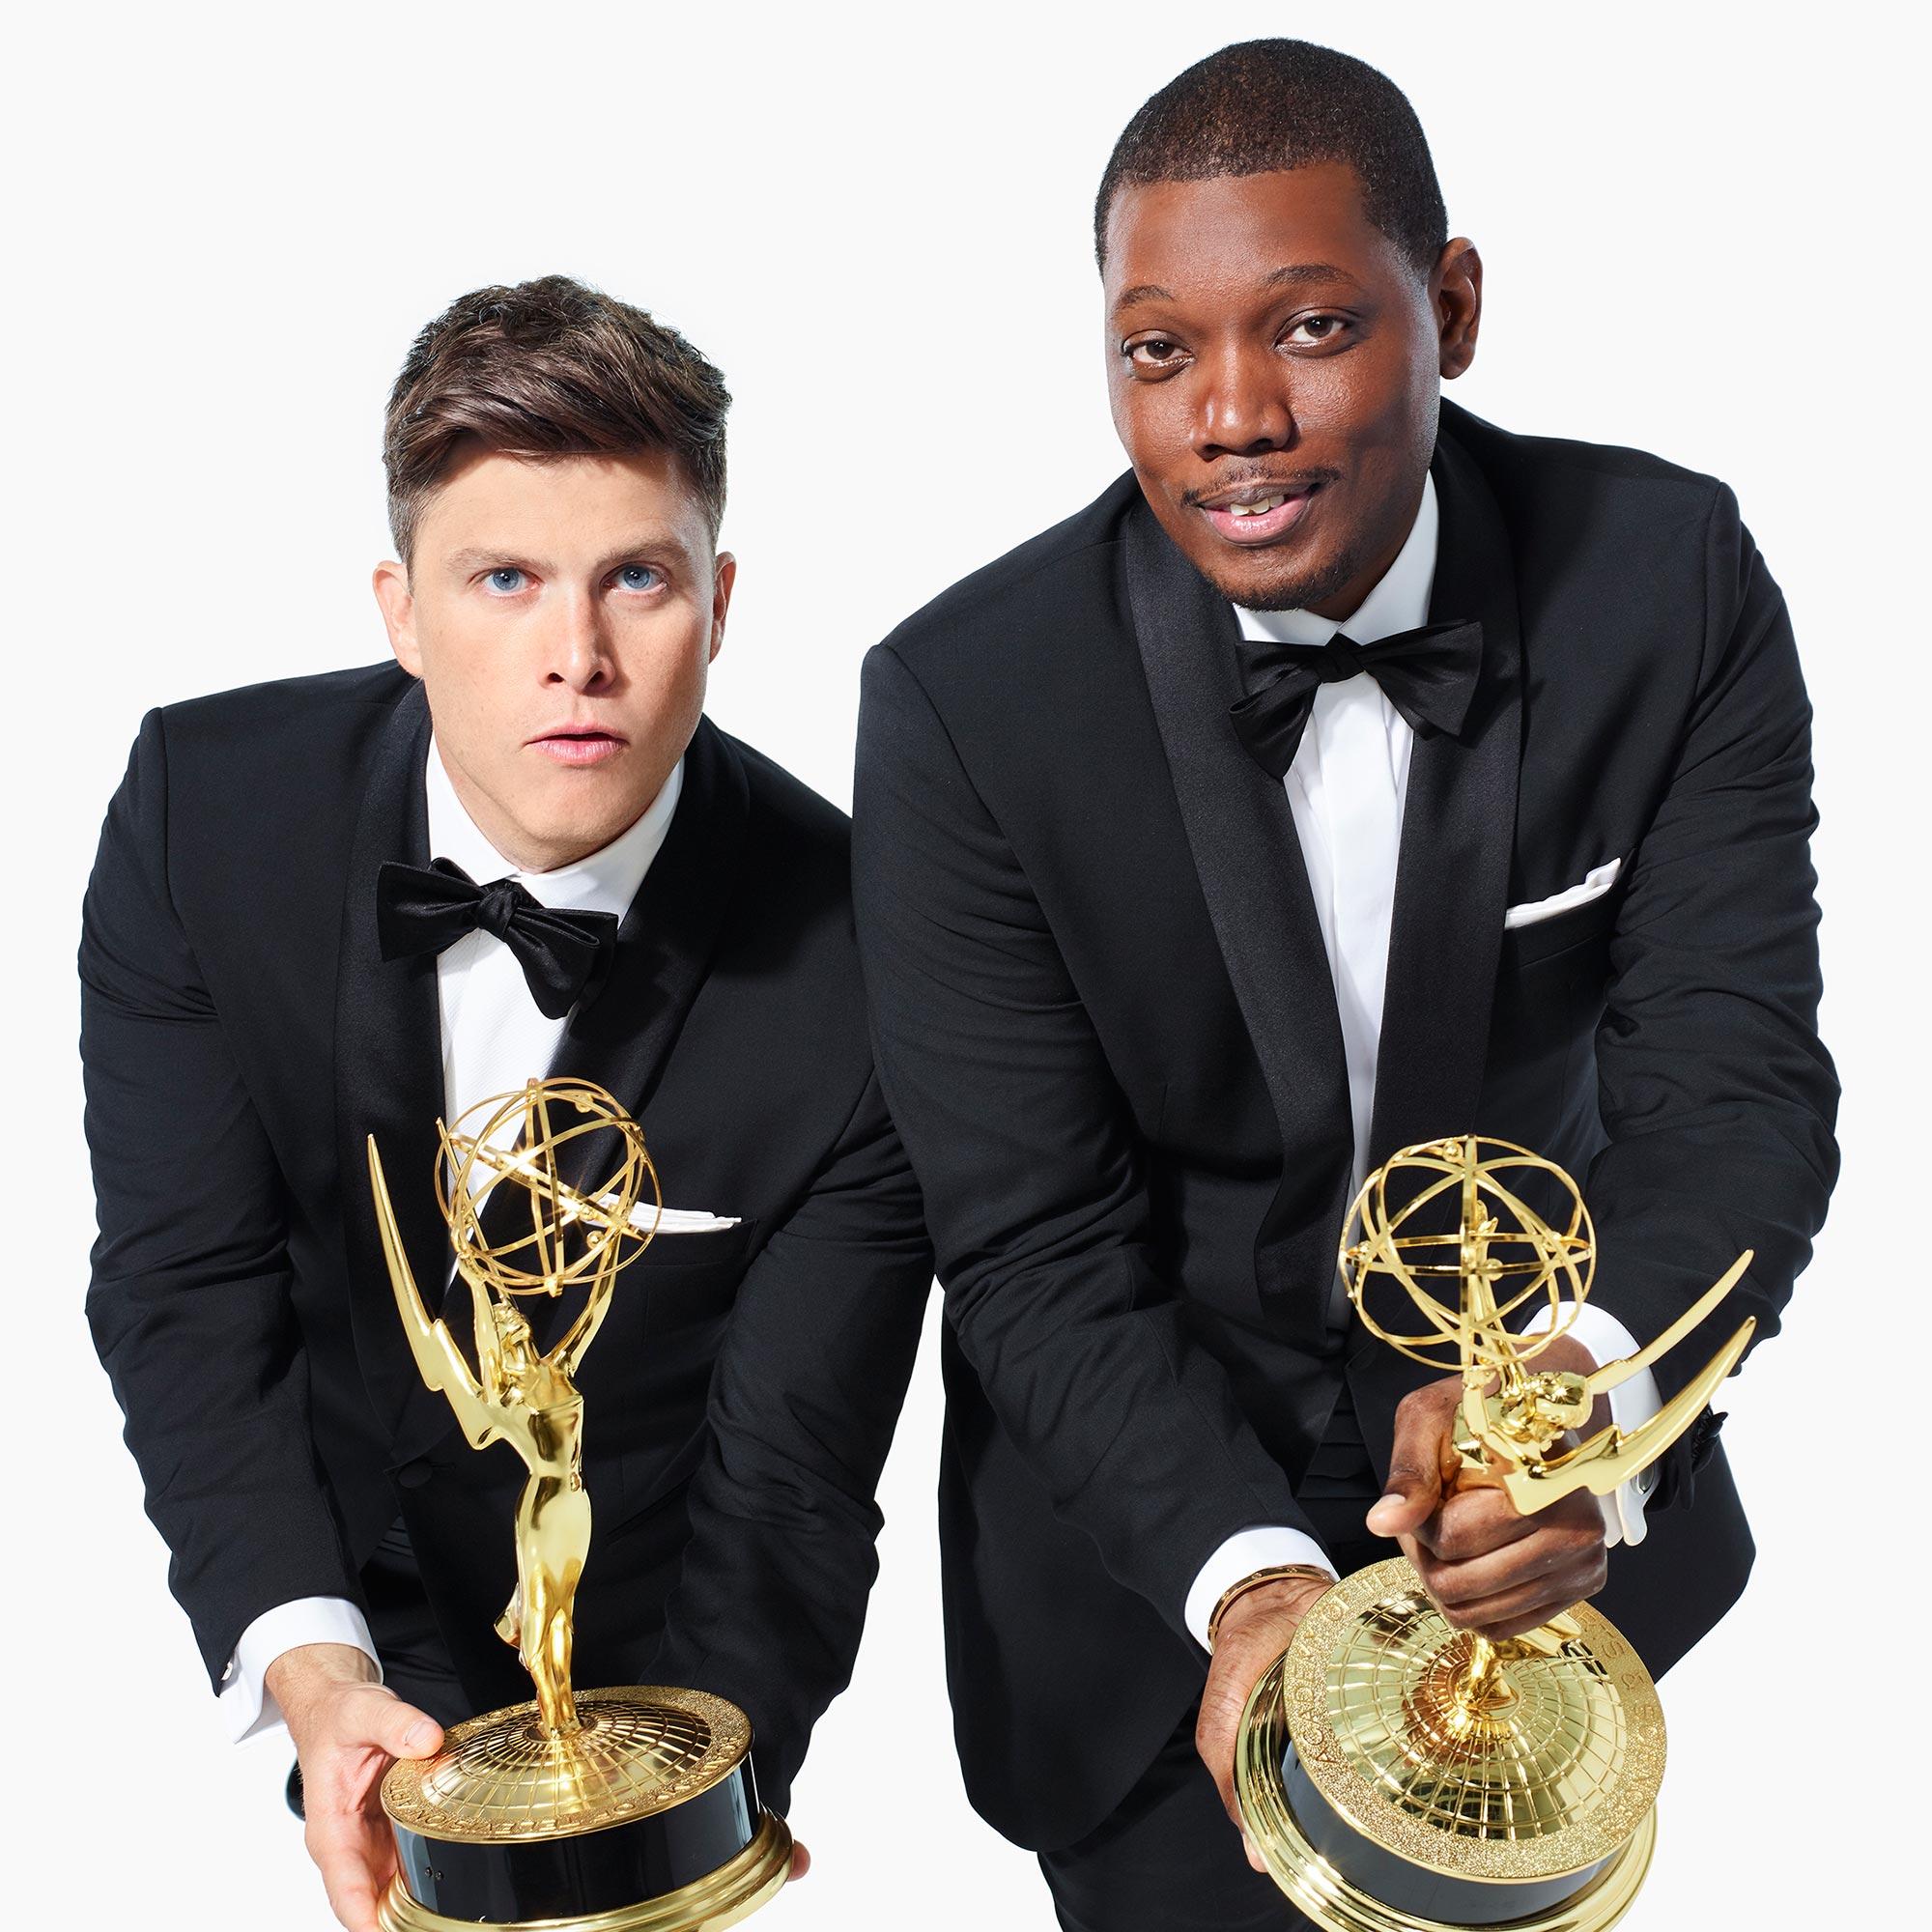 Primetime Emmy Awards - Season 70